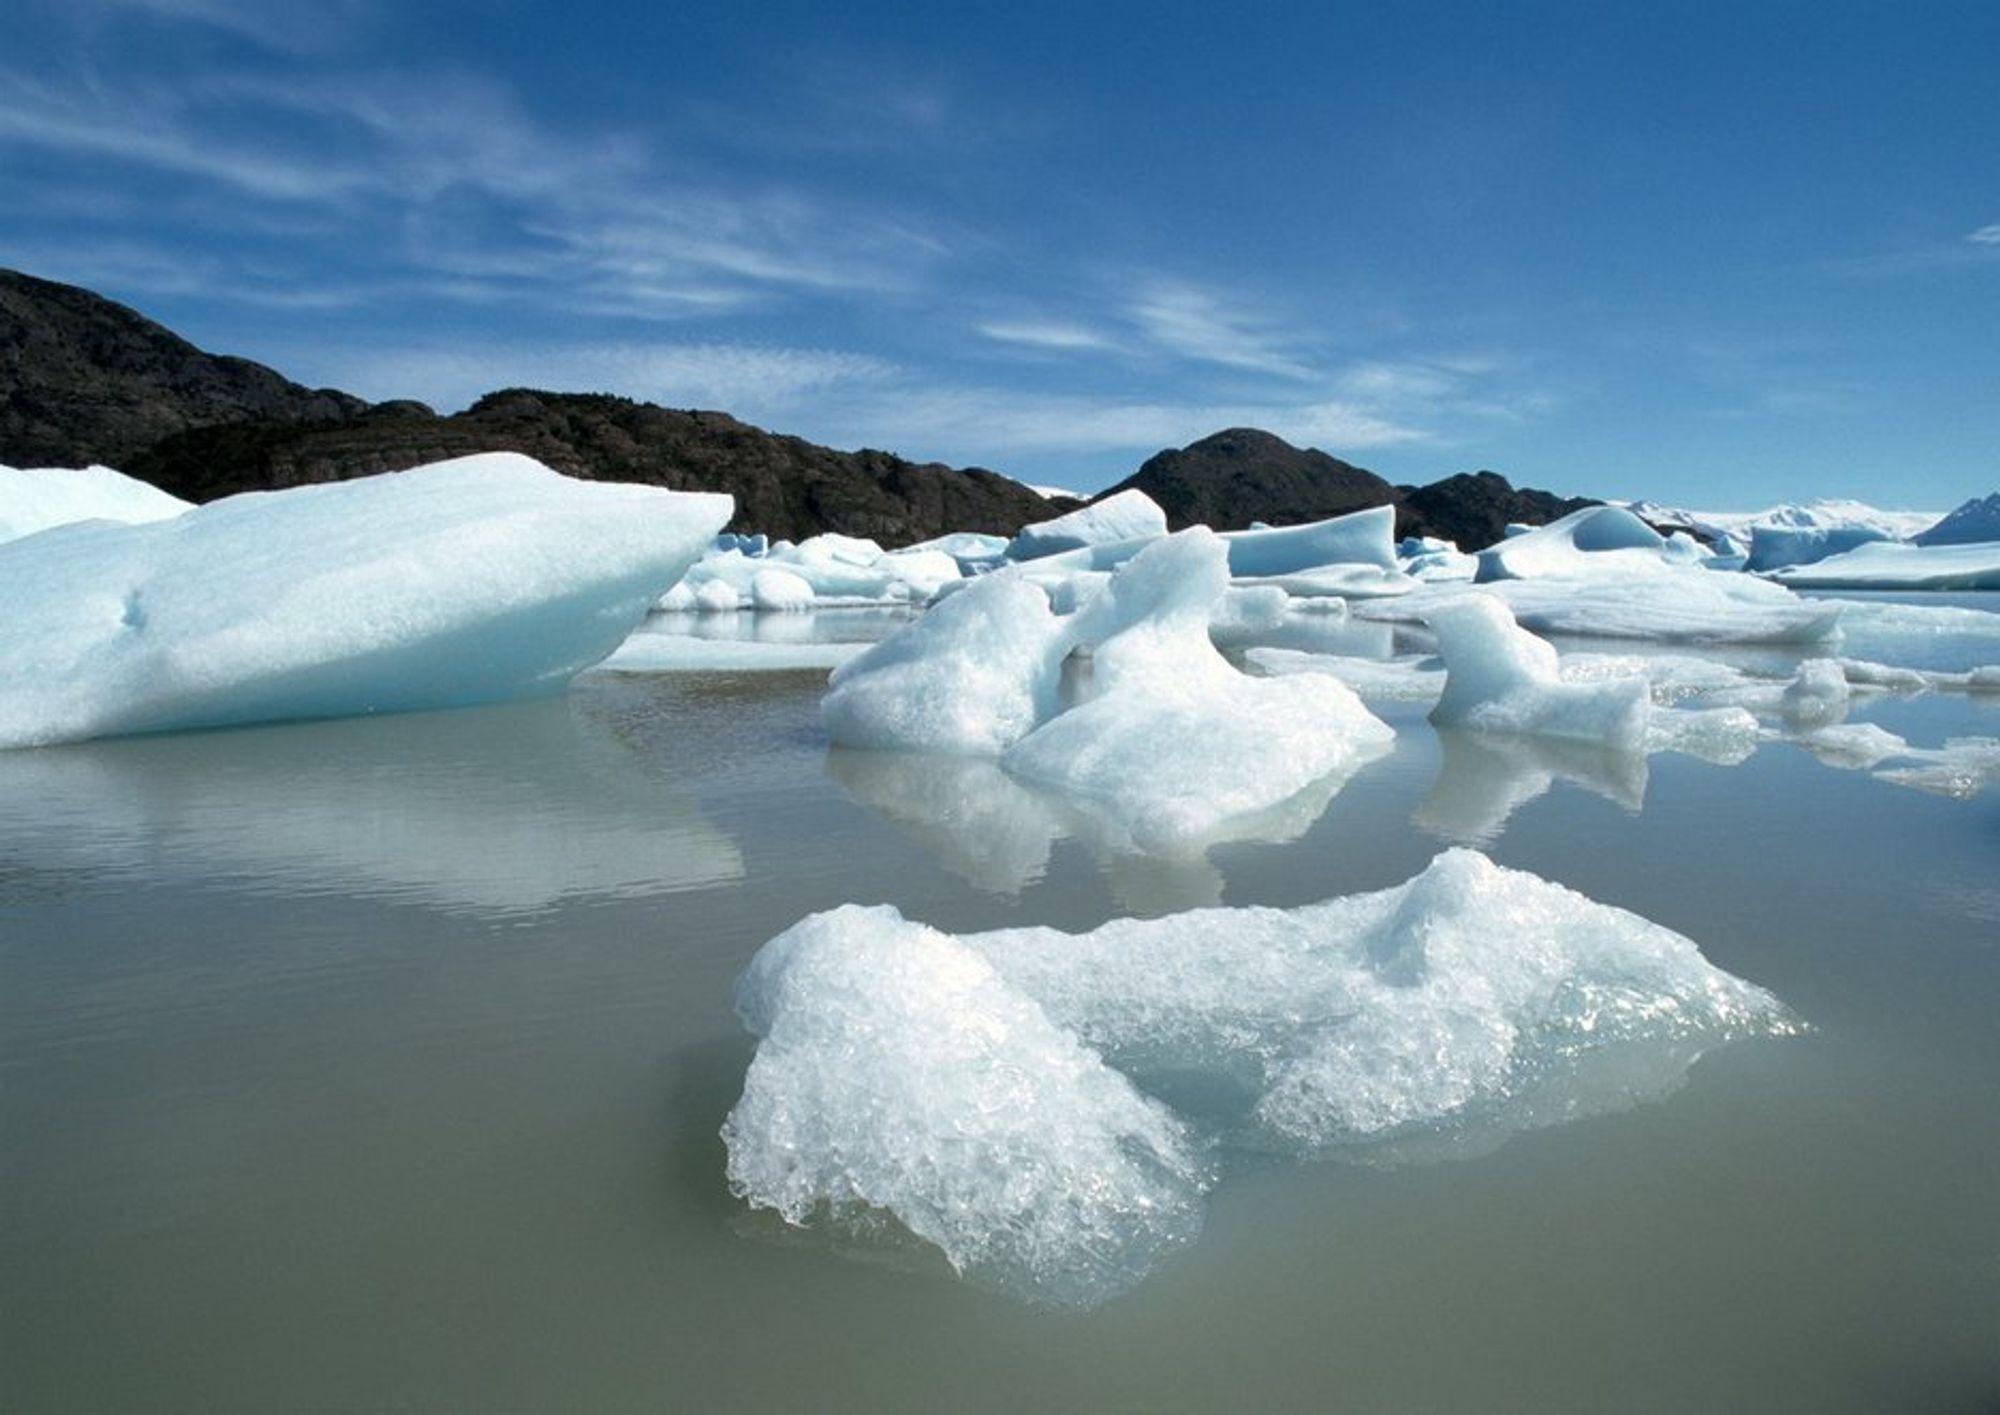 Norge kan bli best i verden på klimavennlig teknologi, mener Norsk Klimastiftelse.